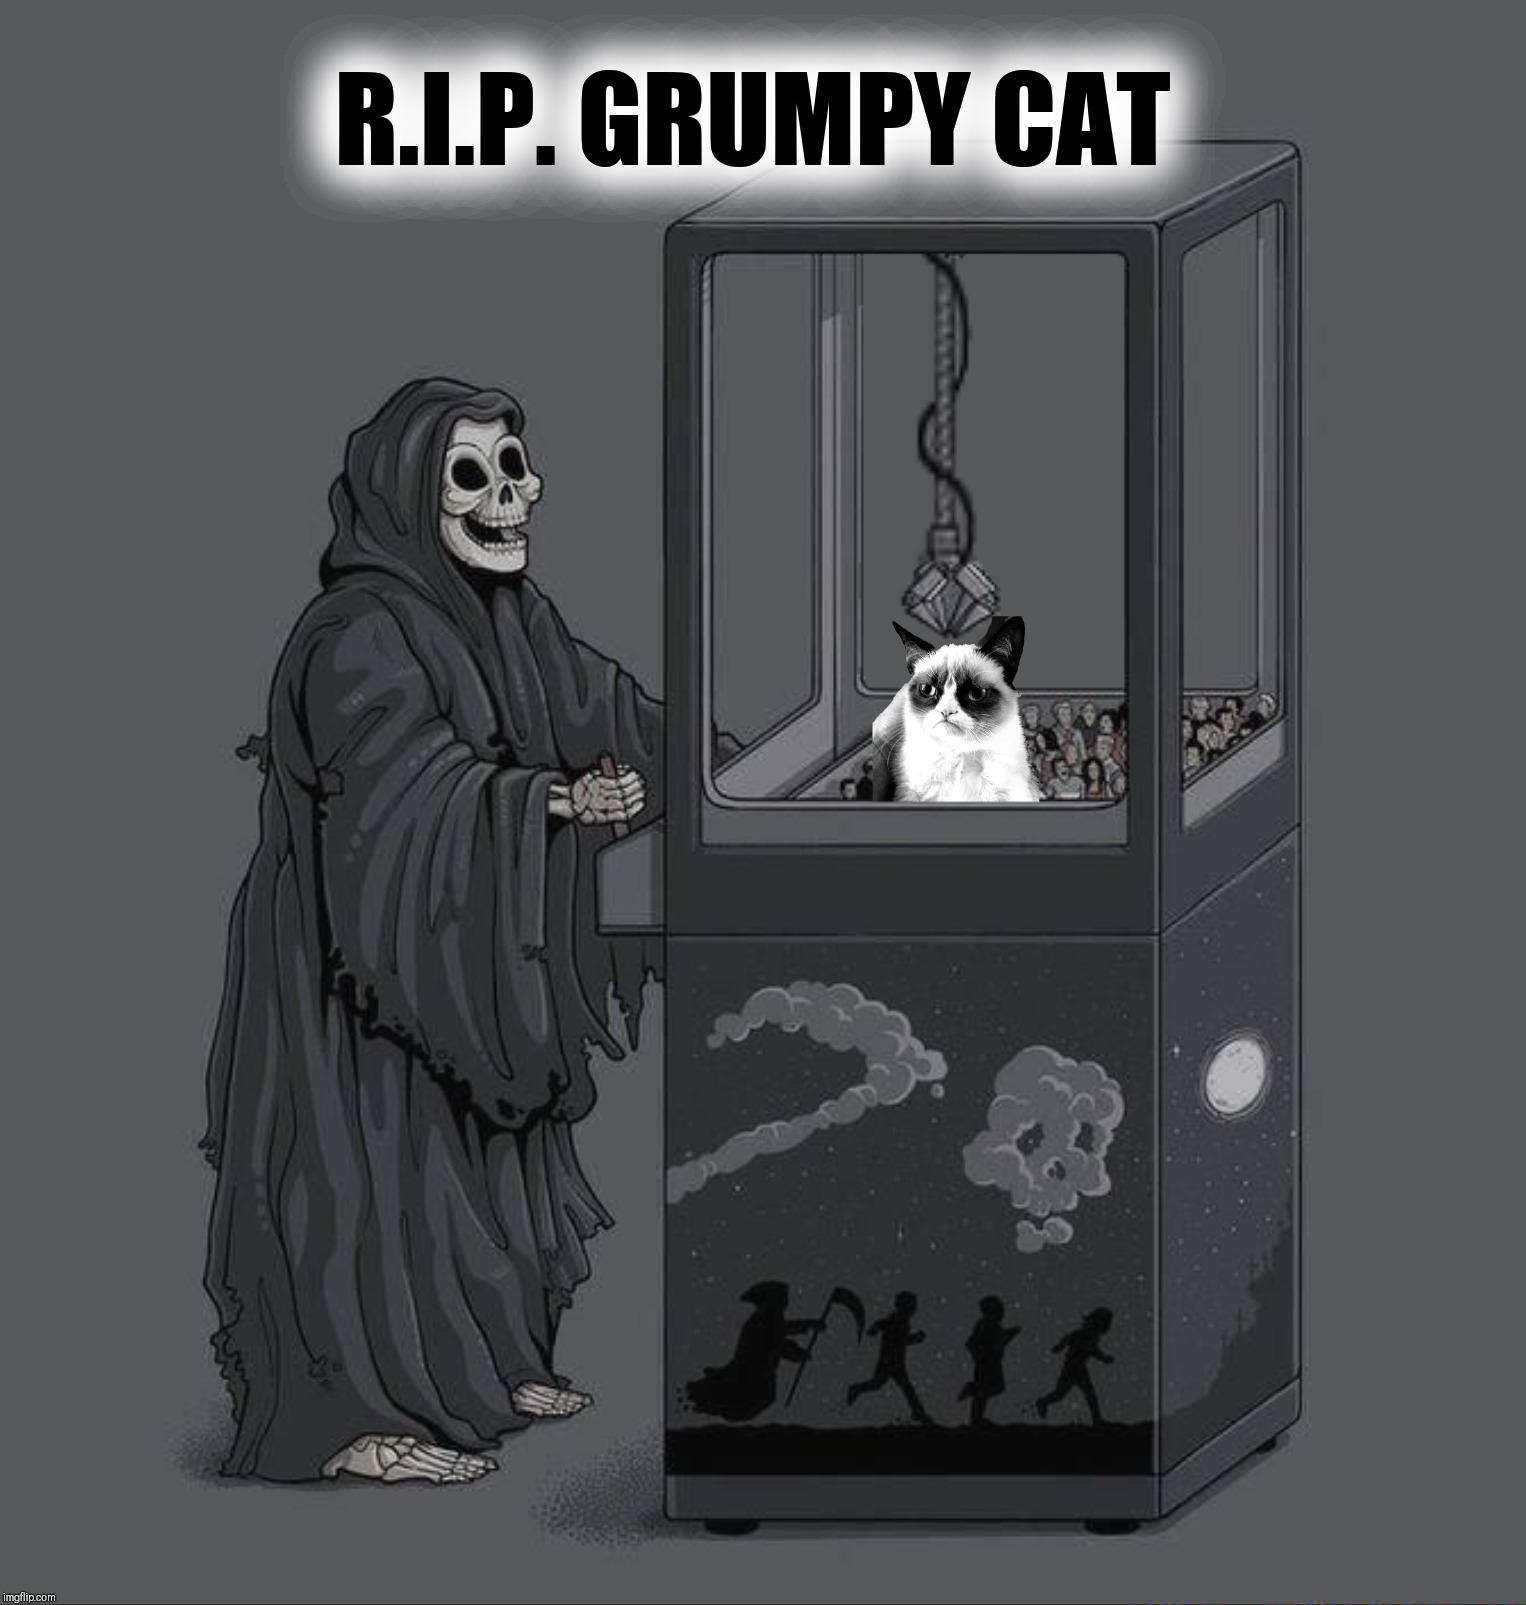 Grumpy Cat Grim Reaper Meme - Alison Handley